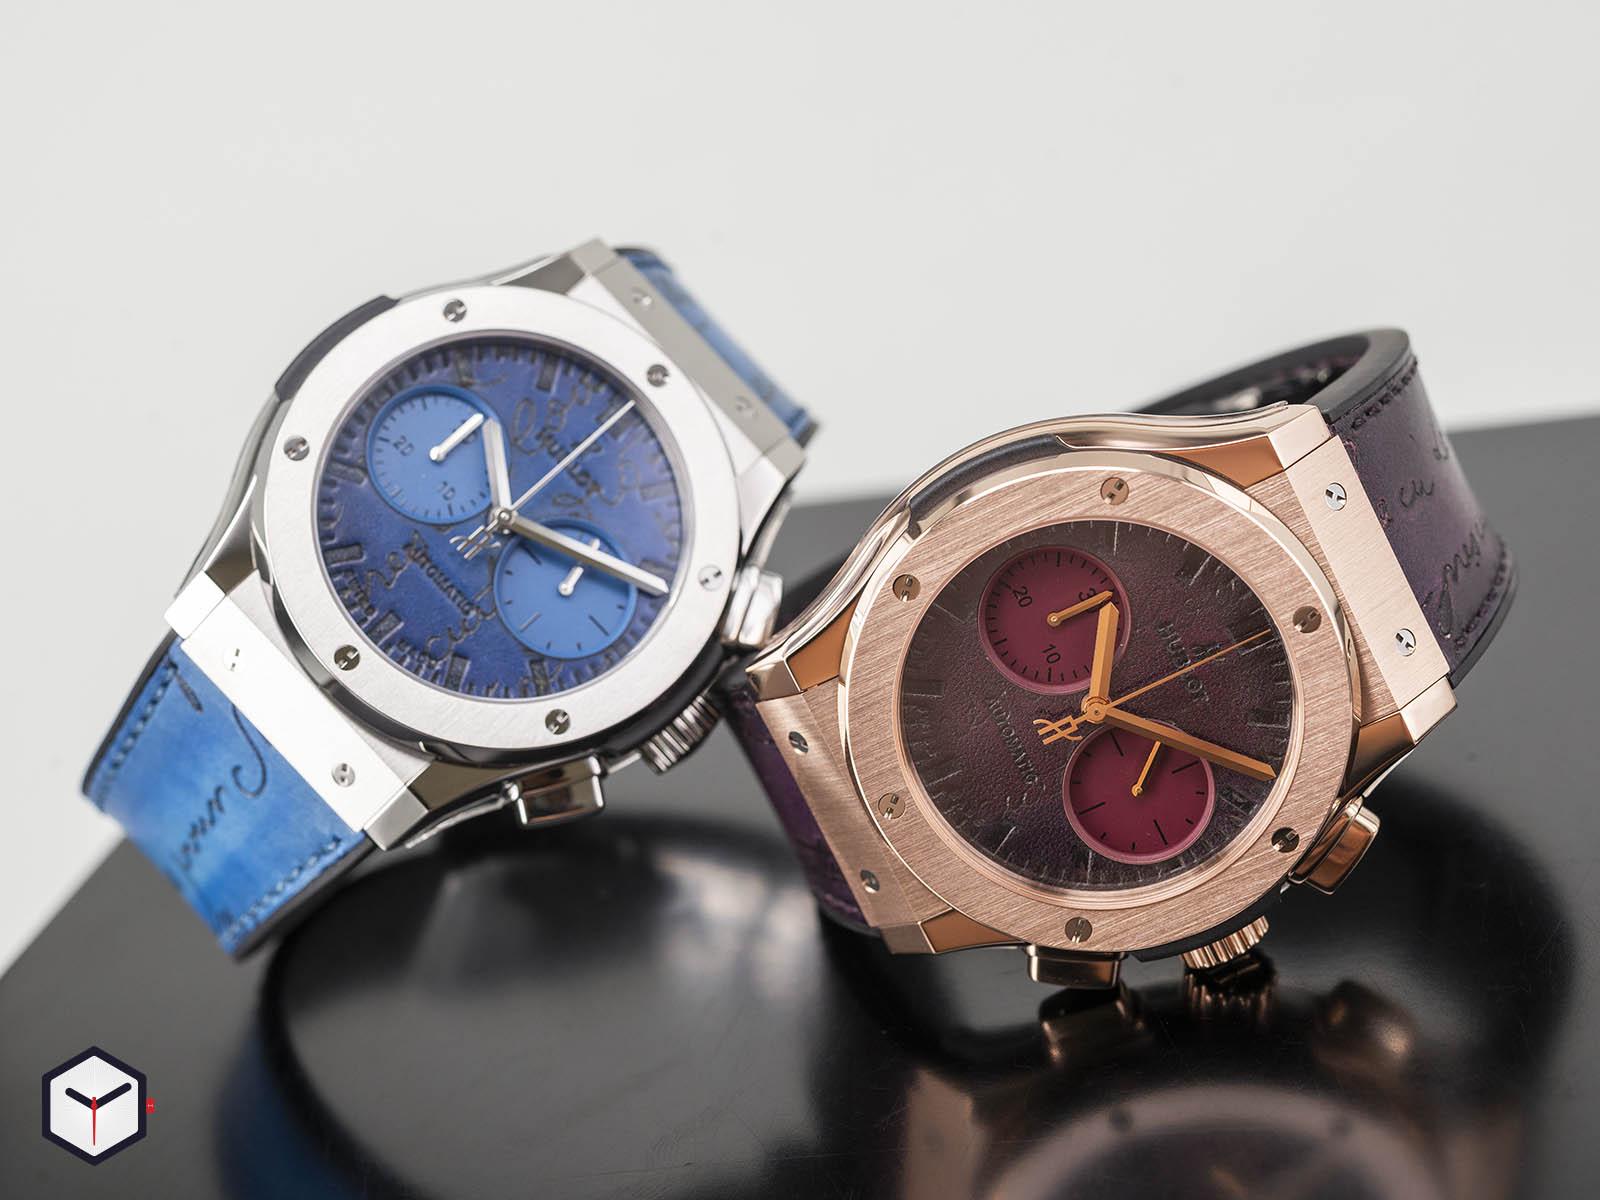 521-nx-050b-vr-ber18-hublot-classic-fusion-chronograph-berluti-scritto-ocean-blue-45mm-5.jpg